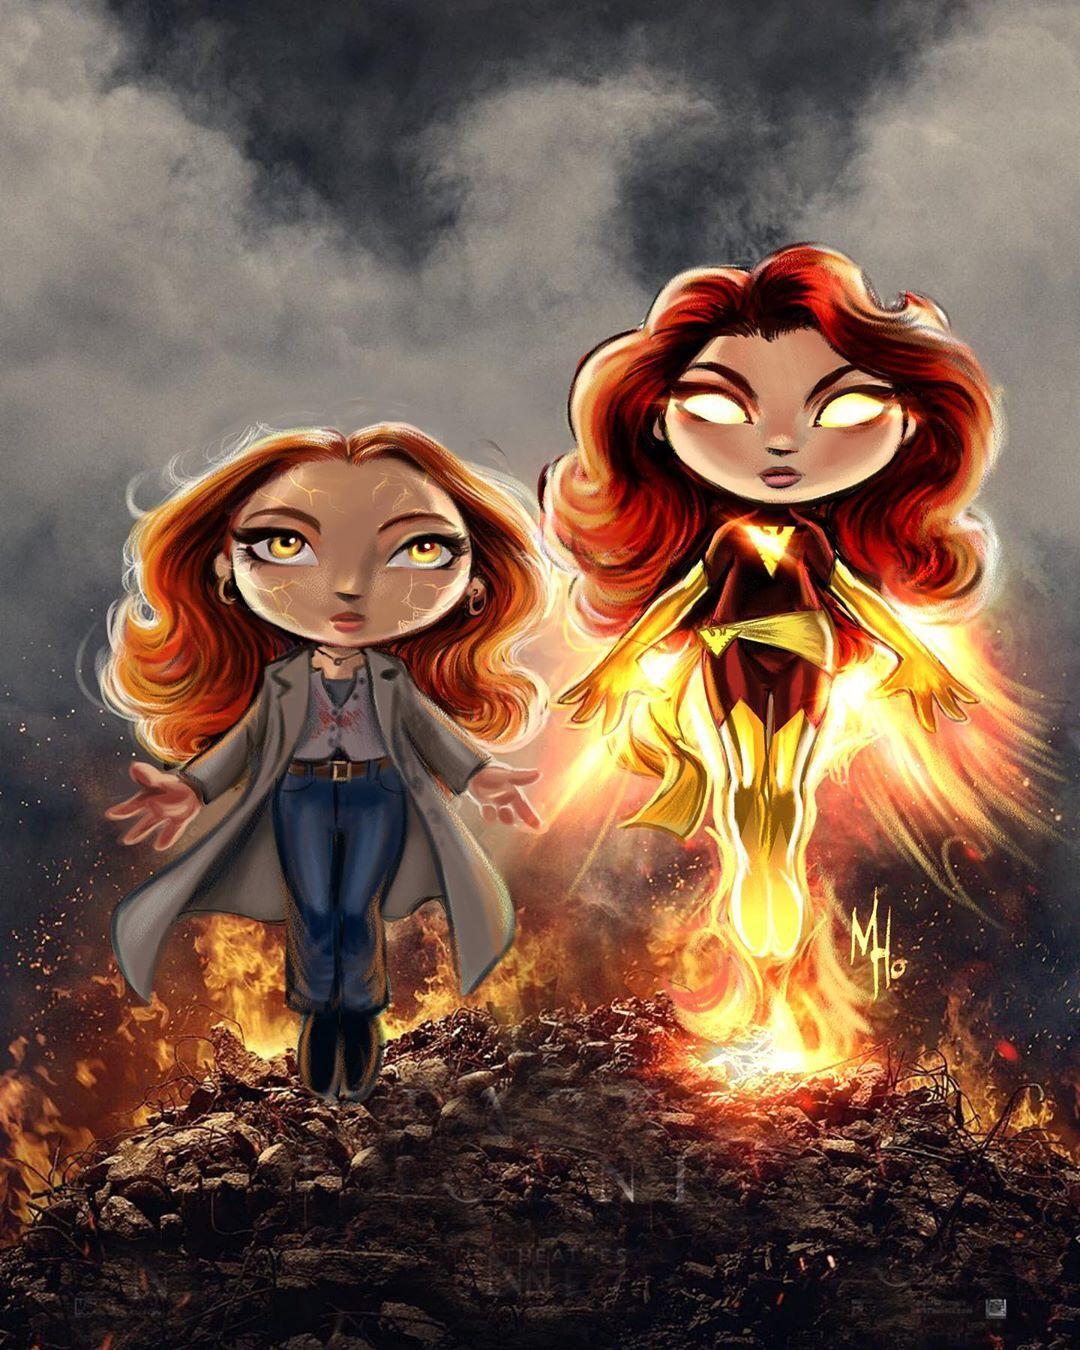 X Men On Instagram X Men Dark Phoenix Movie And Comics Dark Phoenix Jean Grey Sophie Turner Marvel Jean Grey Jean Grey Phoenix Marvel Superheroes